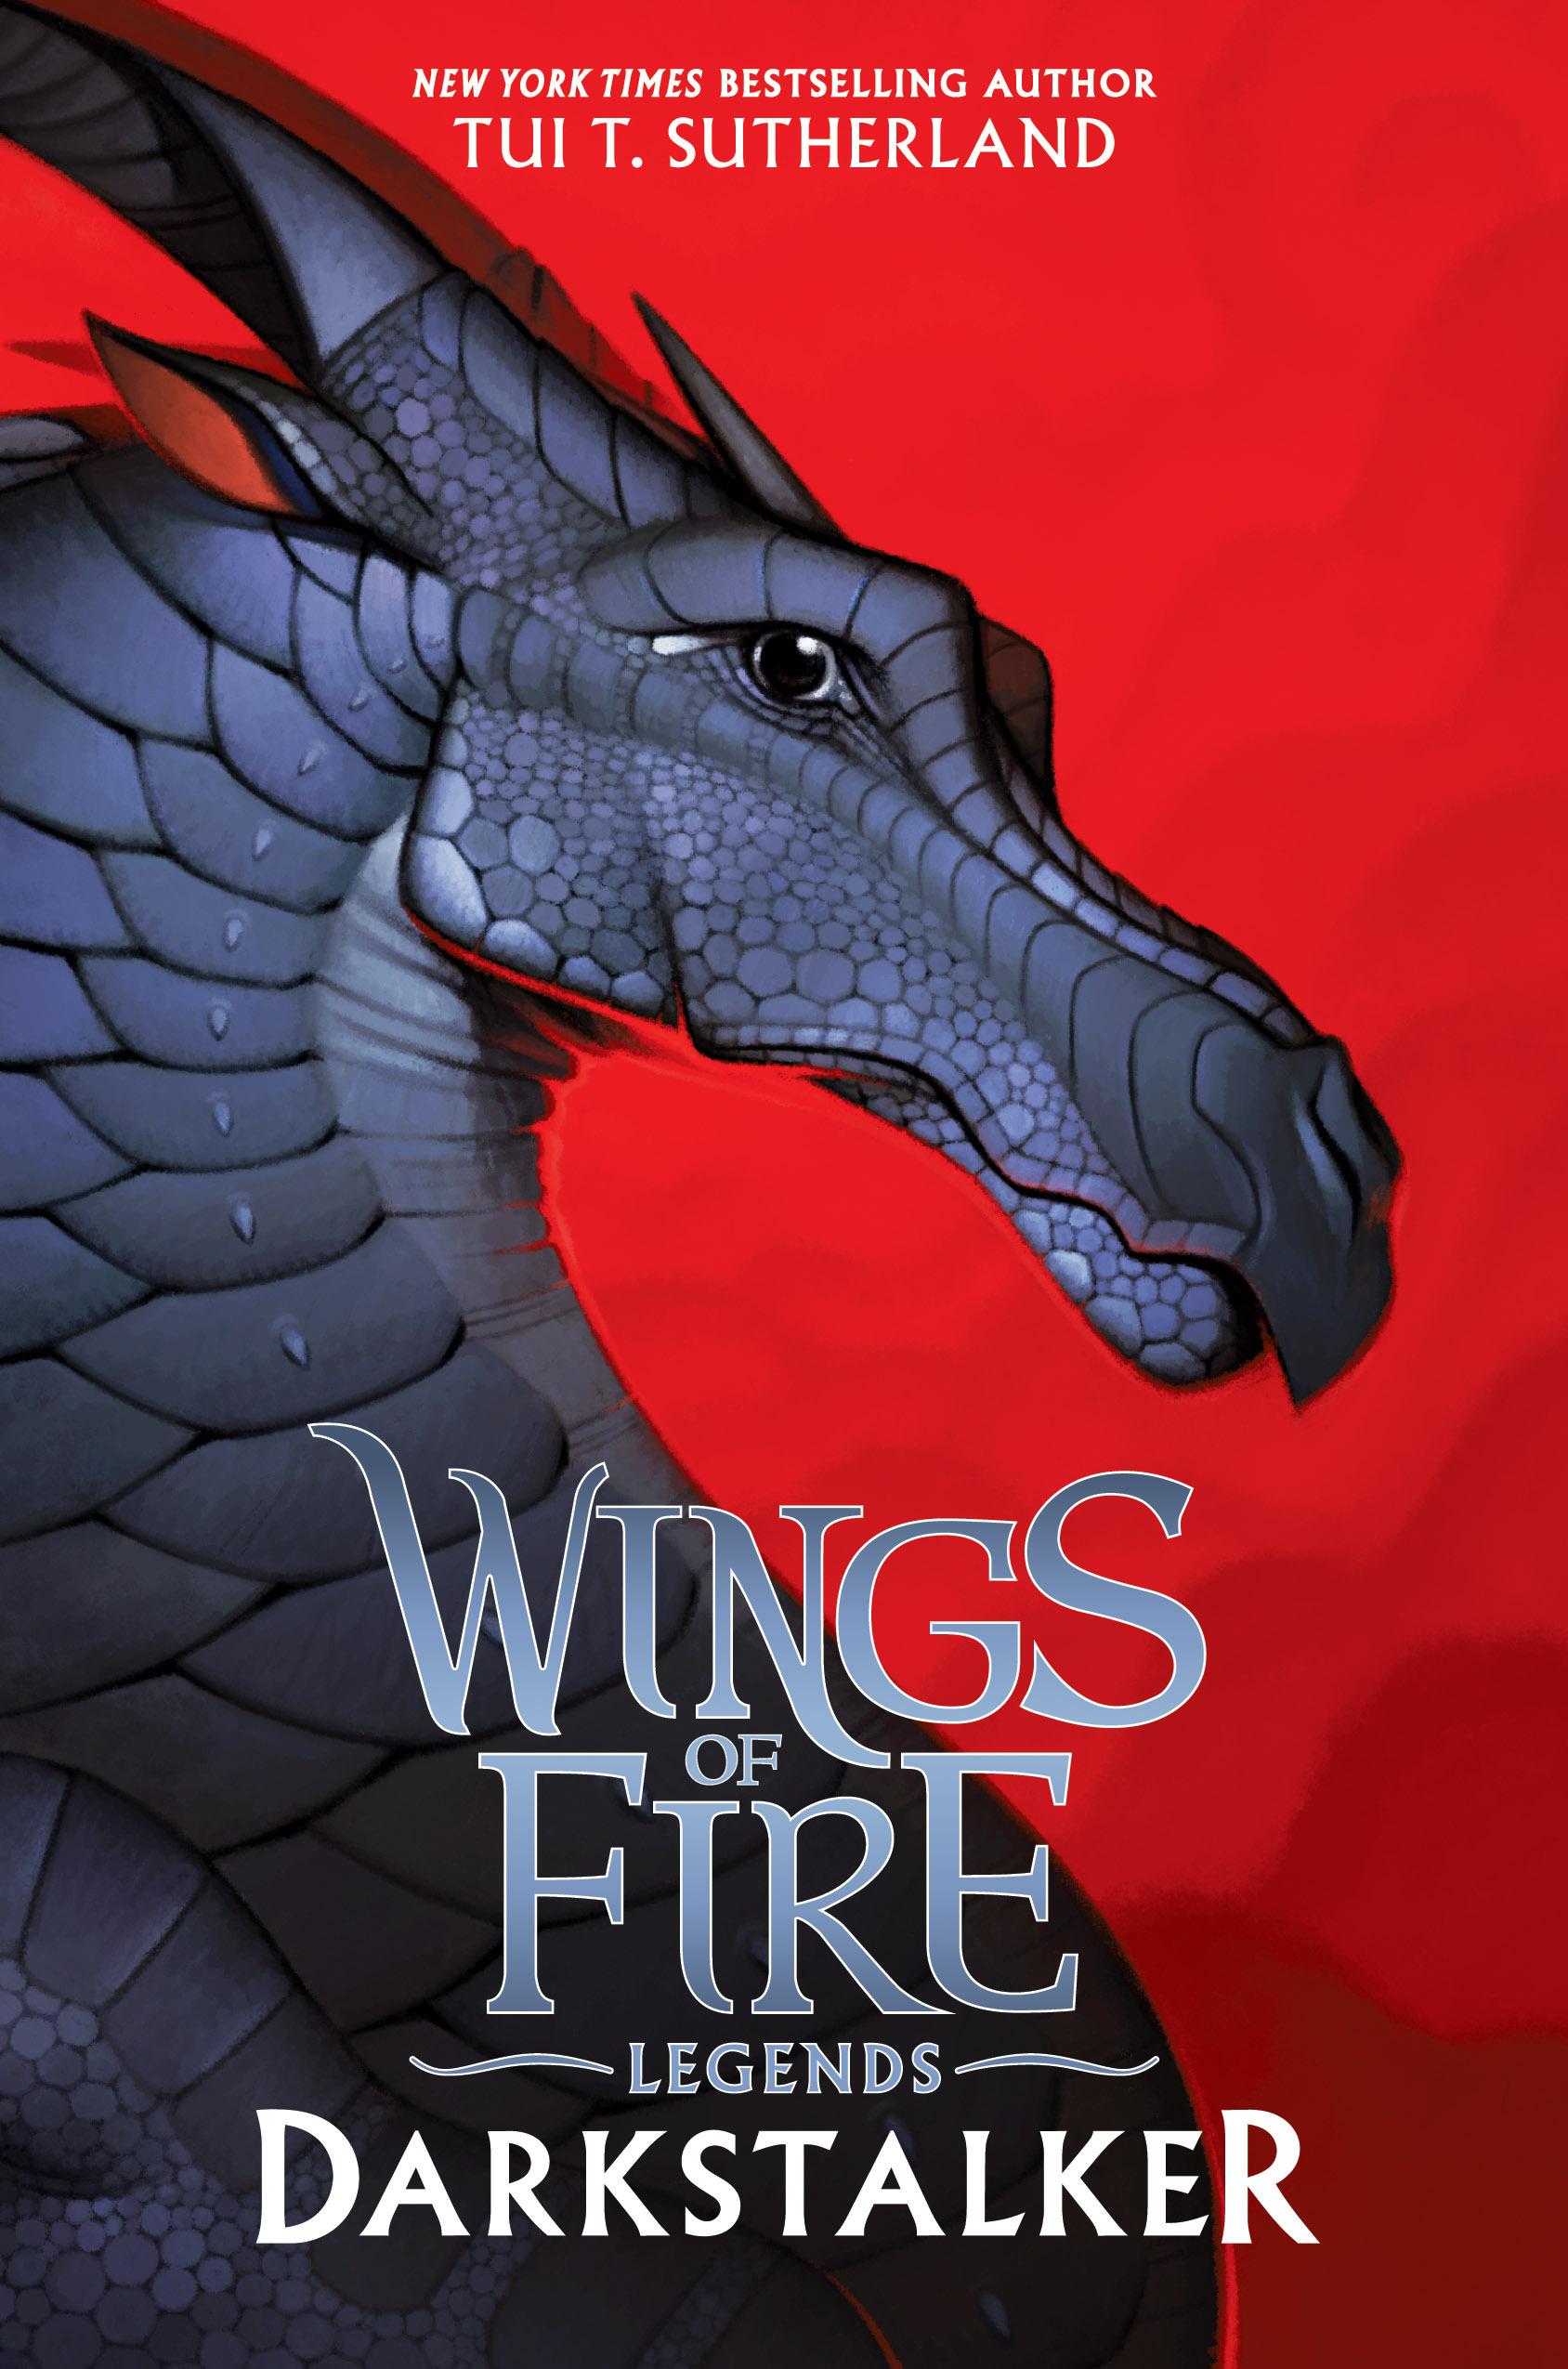 Darkstalker (Wings of Fire: Legends, #1) by Tui T  Sutherland